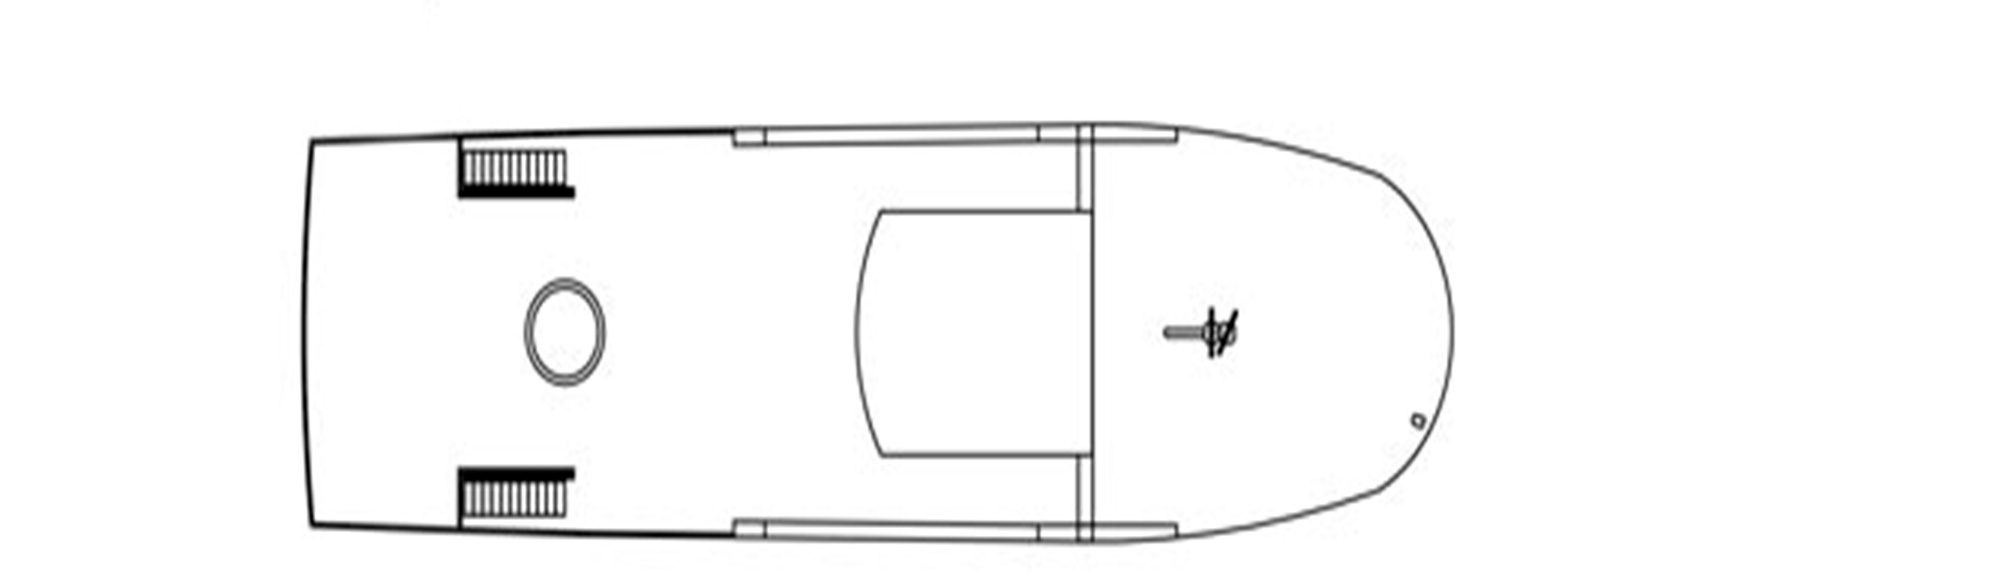 Cuba liveaboard diving - sun deck plan